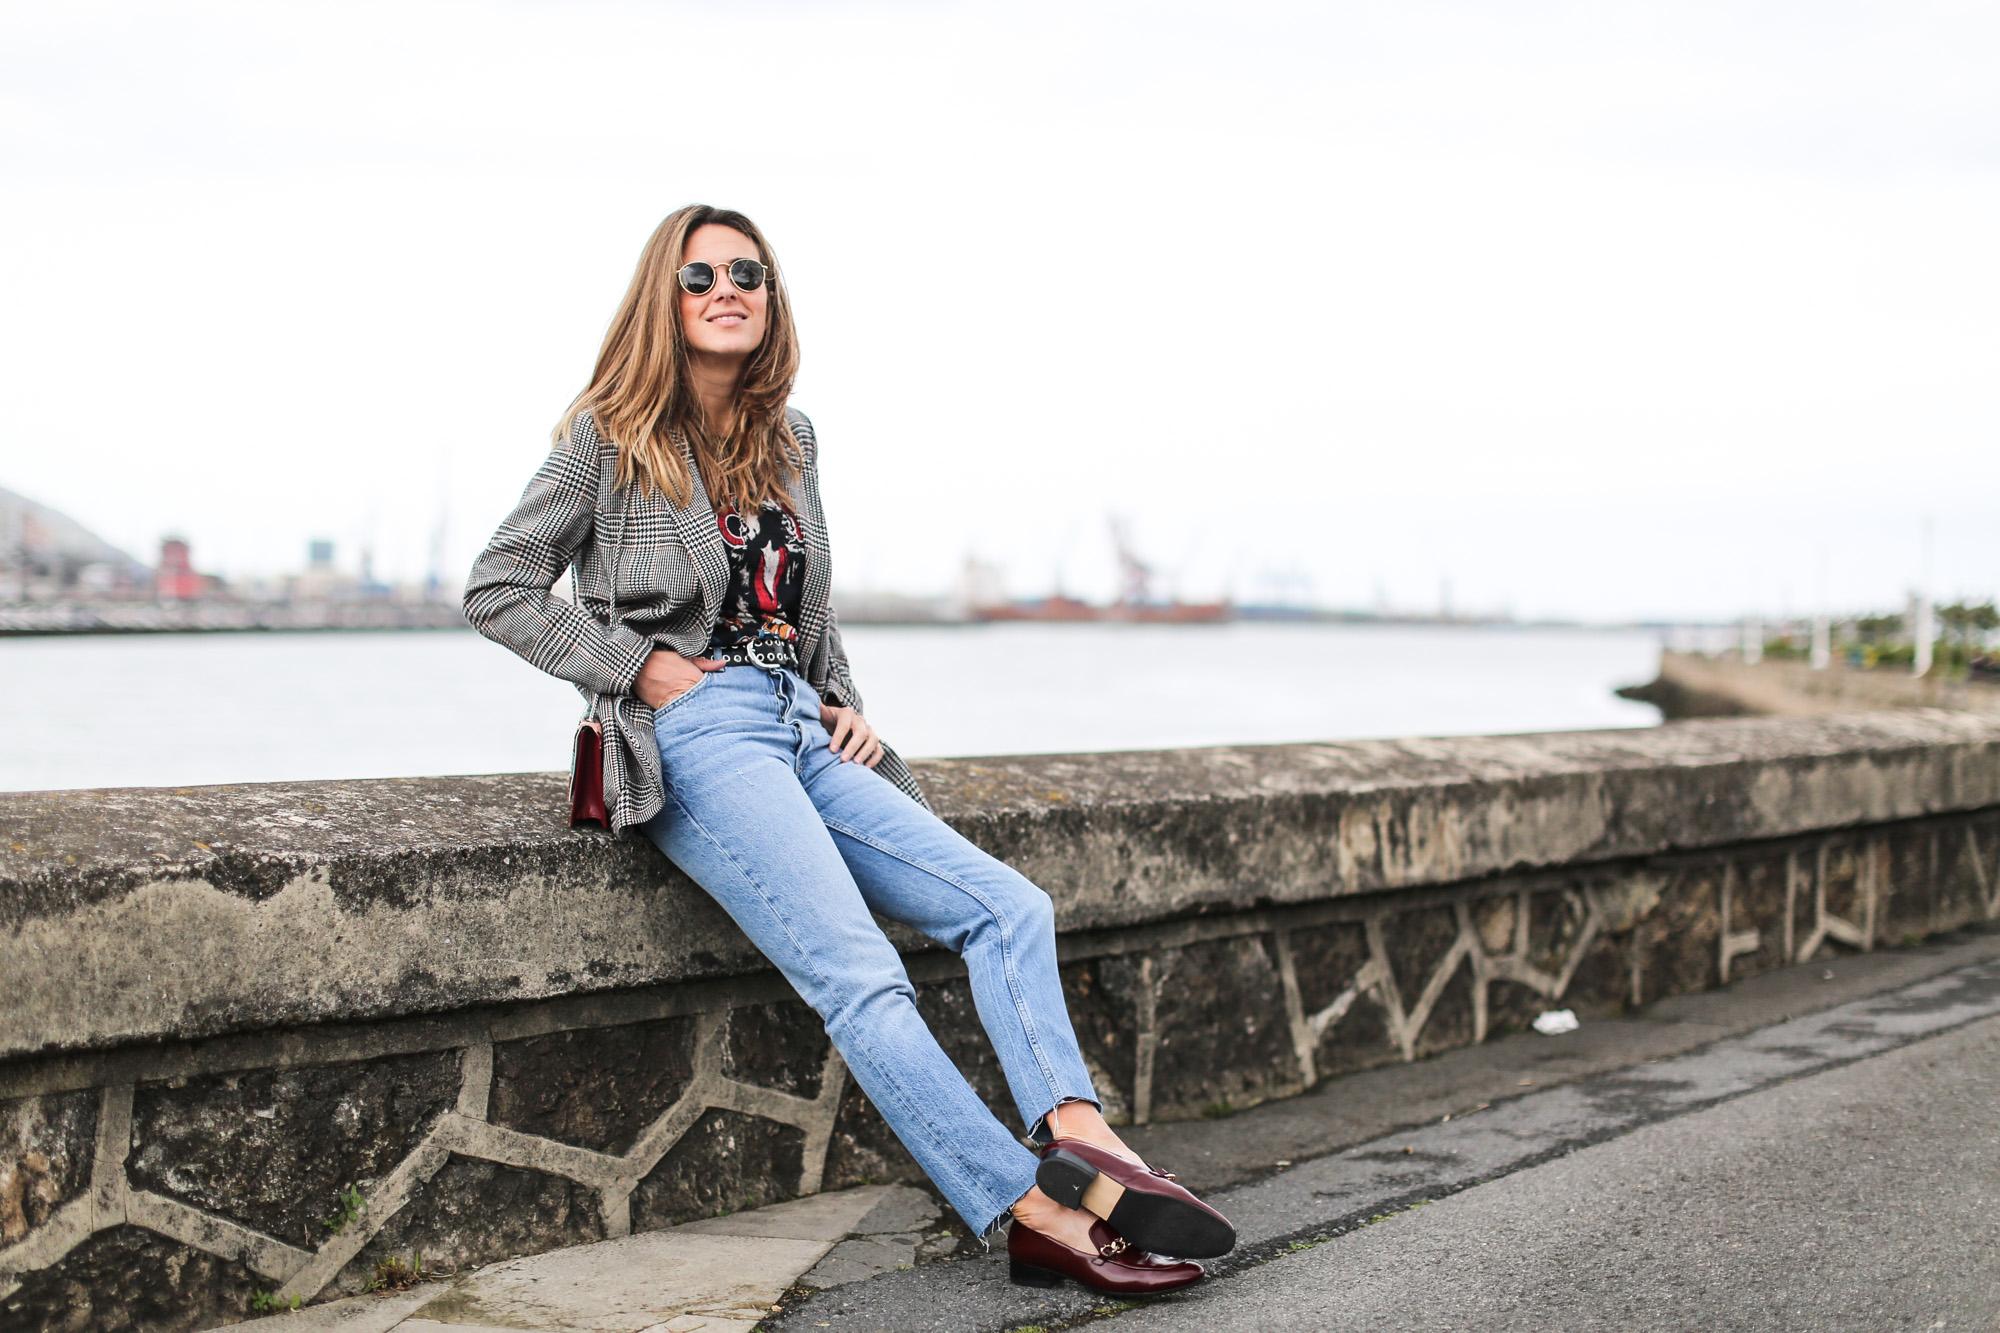 Clochet_jeansvintagetiroaltozara-6